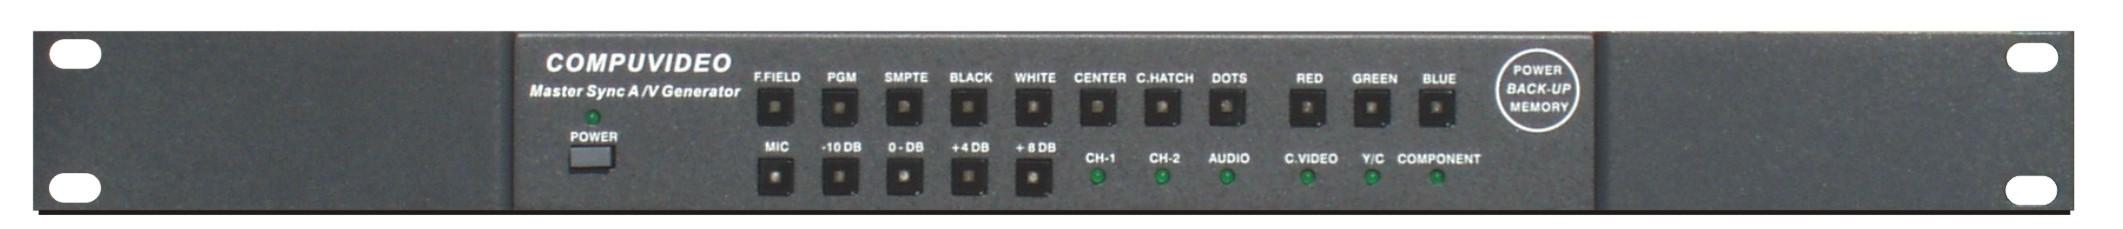 Compuvideo CV-9000 N(RM)